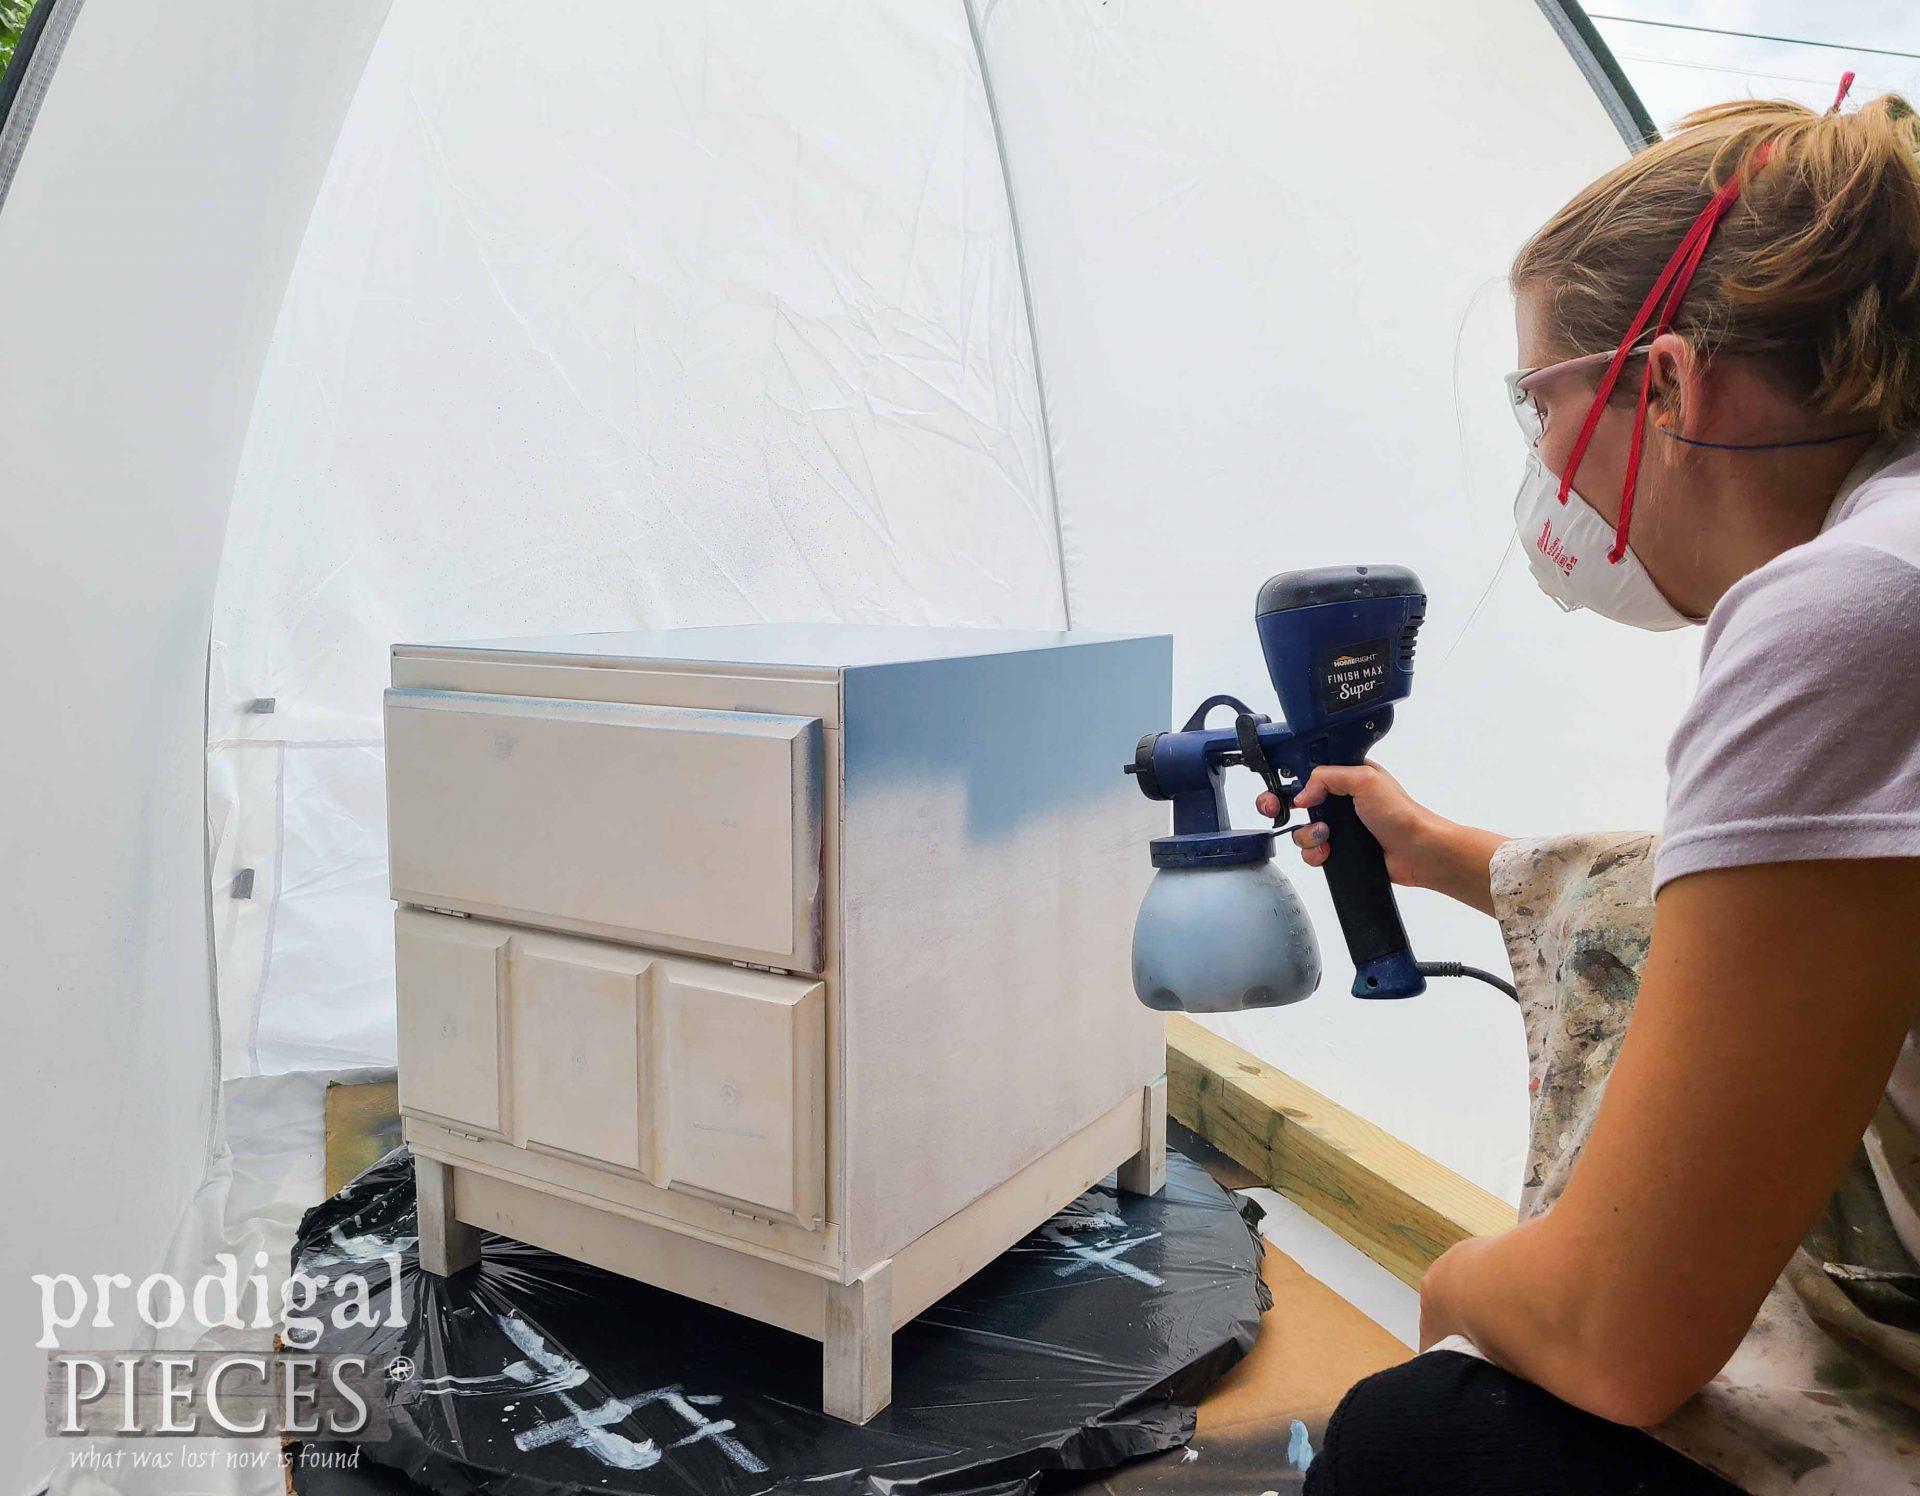 Larissa Spray Painting Rebuilt Vintage Cabinet Side Table   prodigalpieces.com